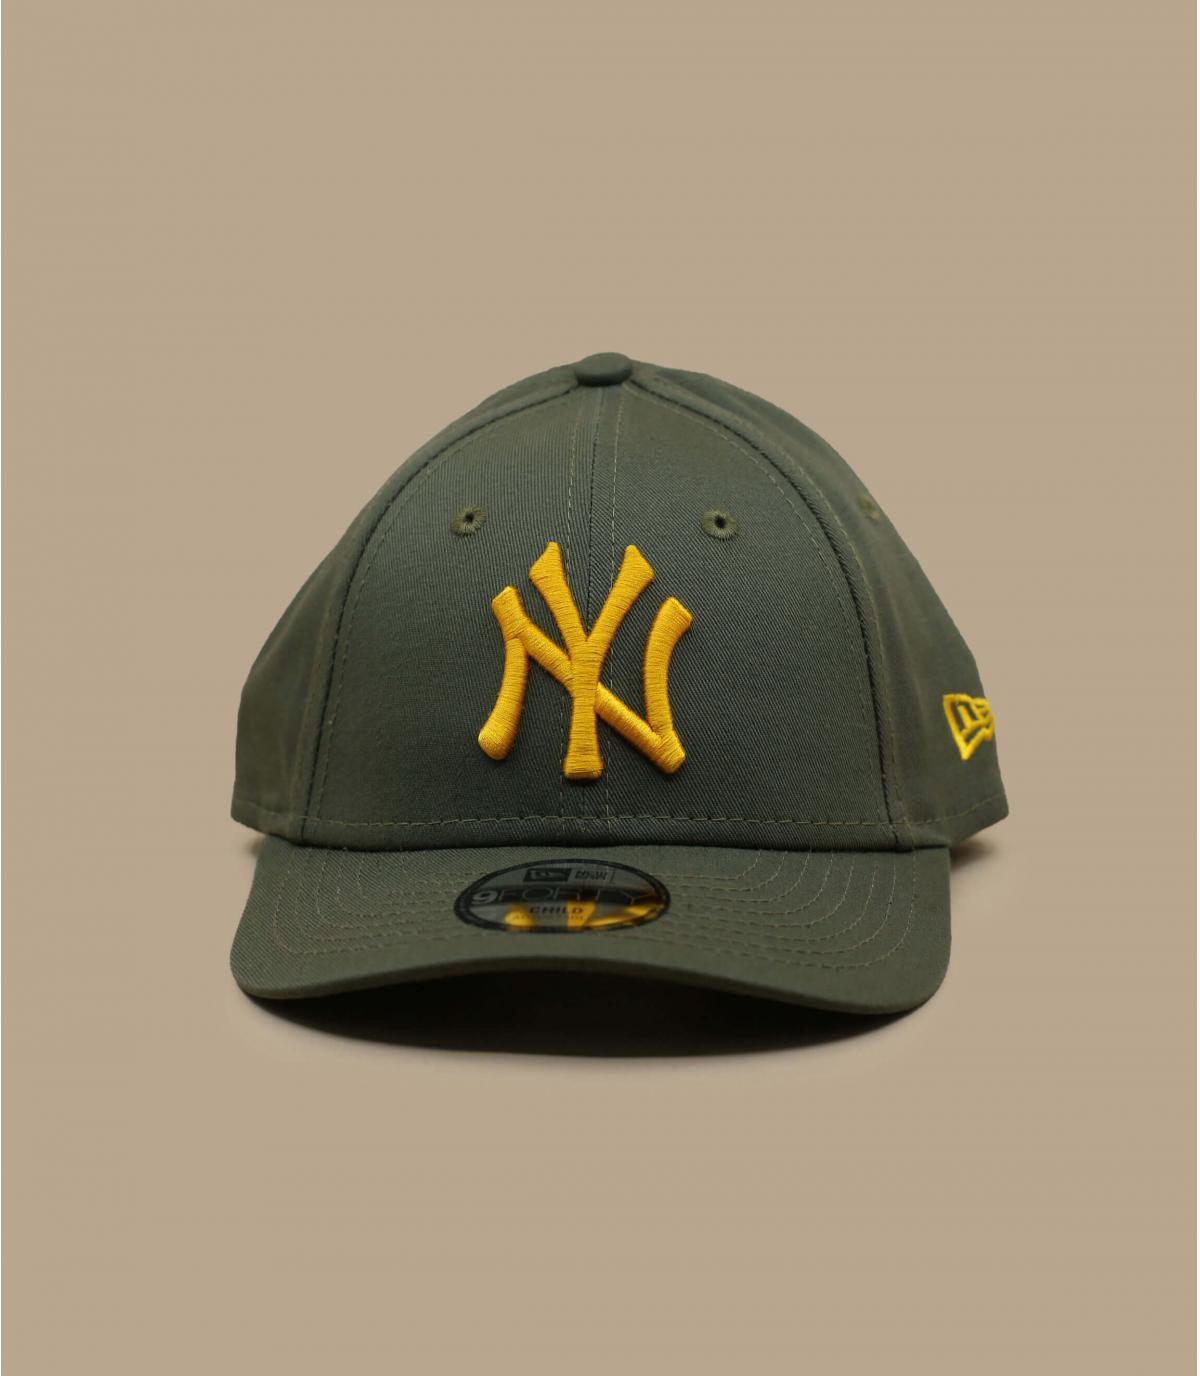 casquette enfant NY vert jaune